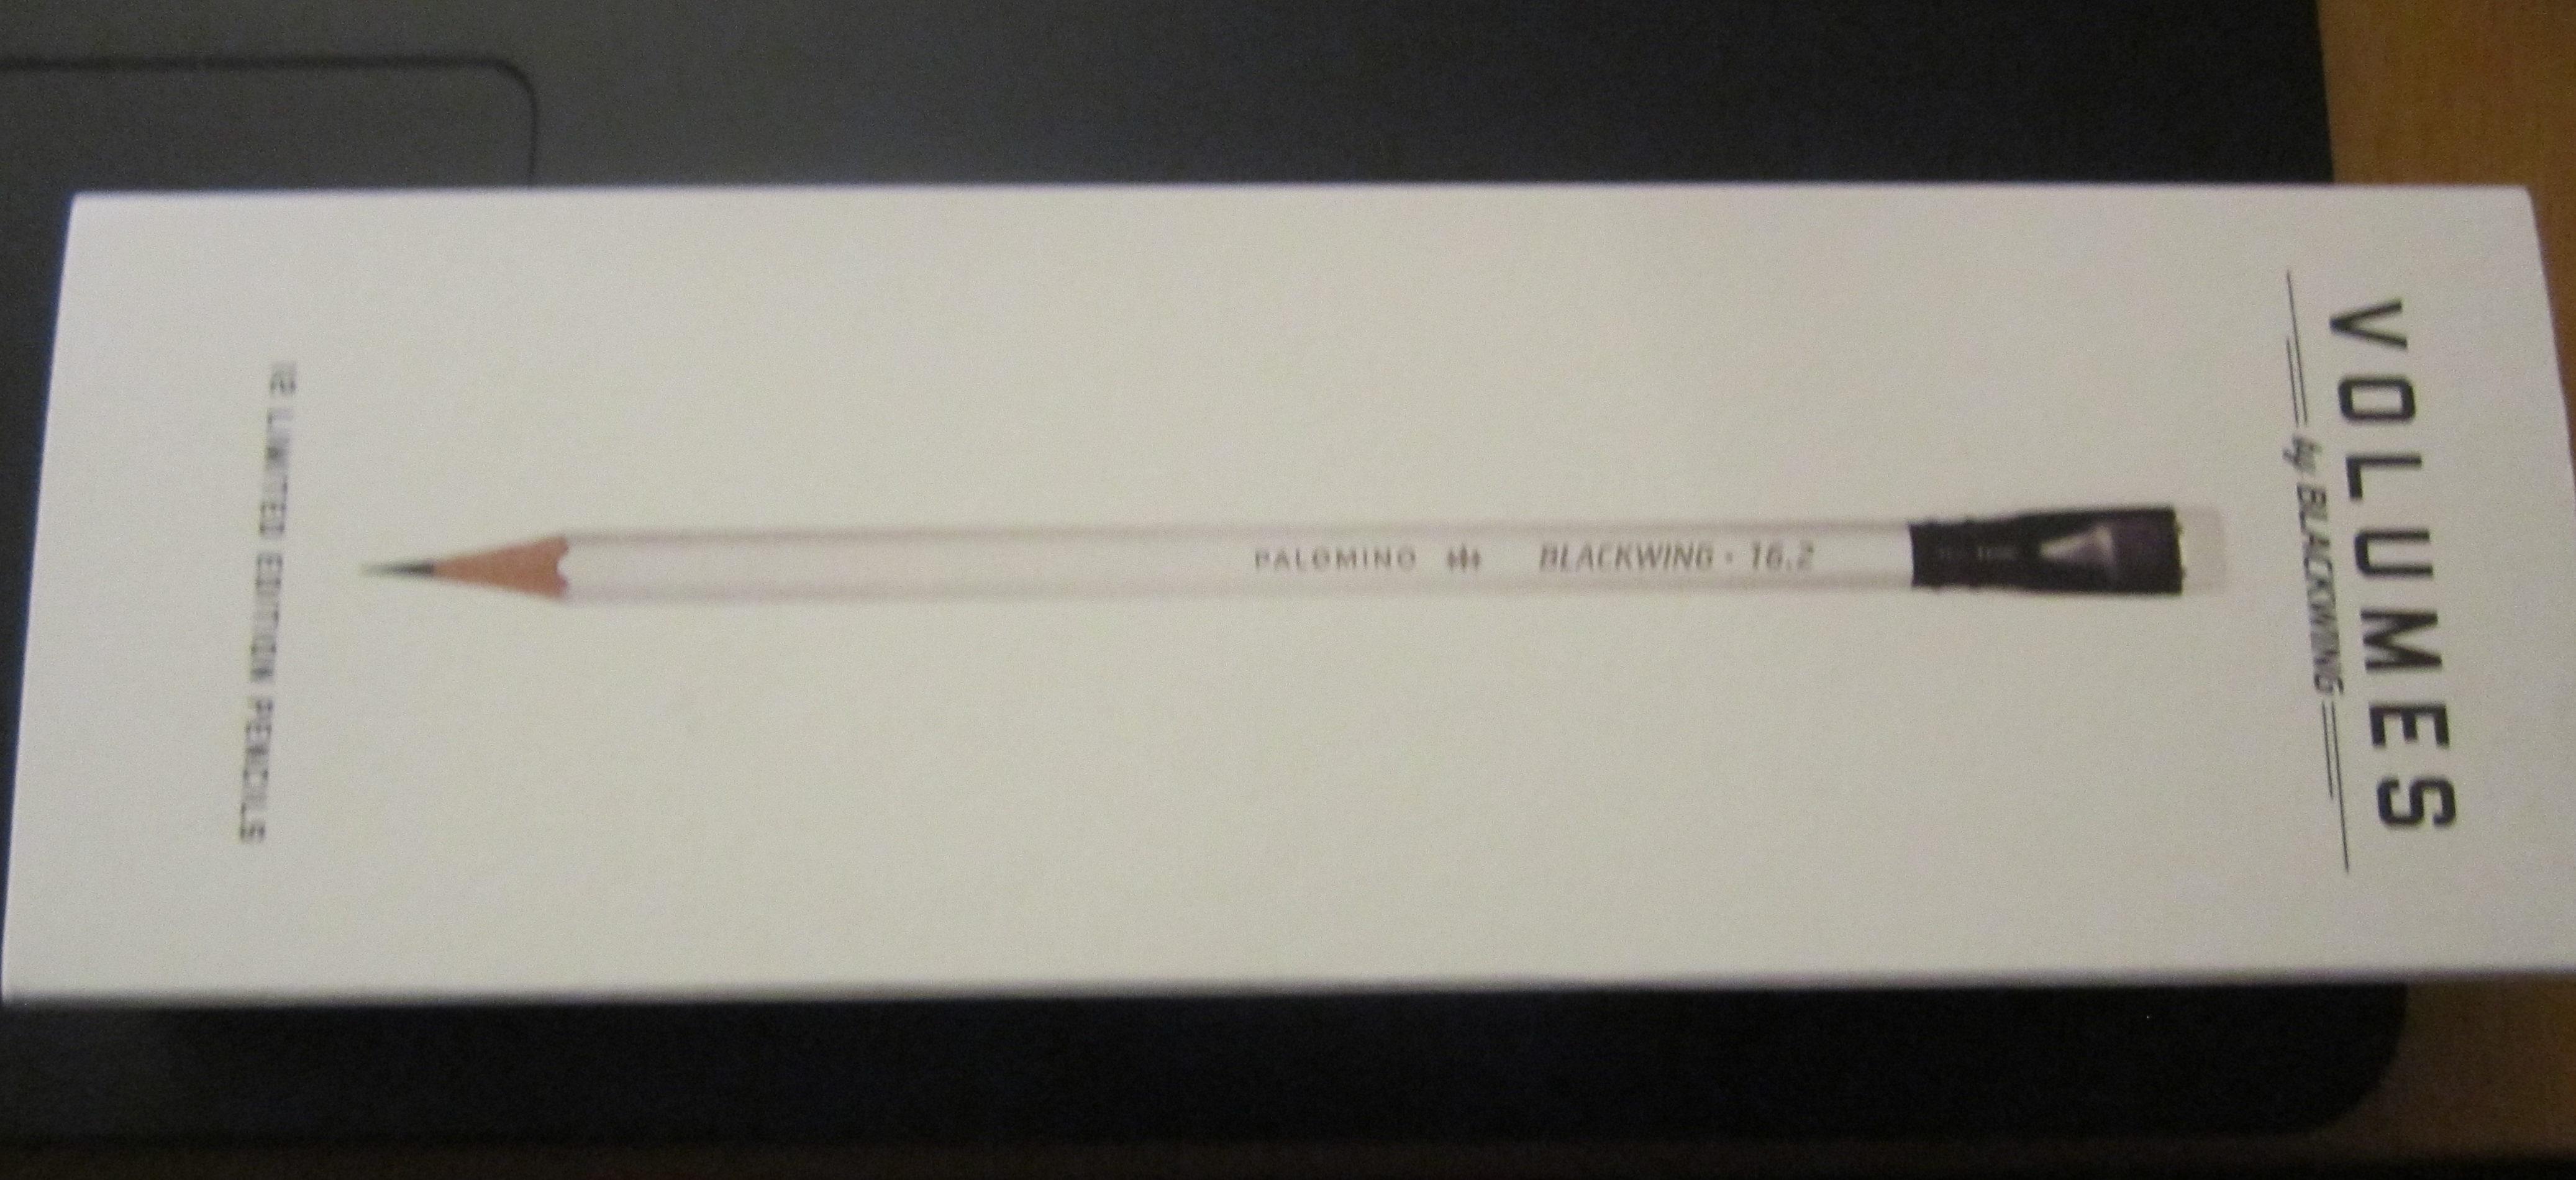 Pen/Pencil Review] Palomino Blackwing 16 2 – Ada Lovelace